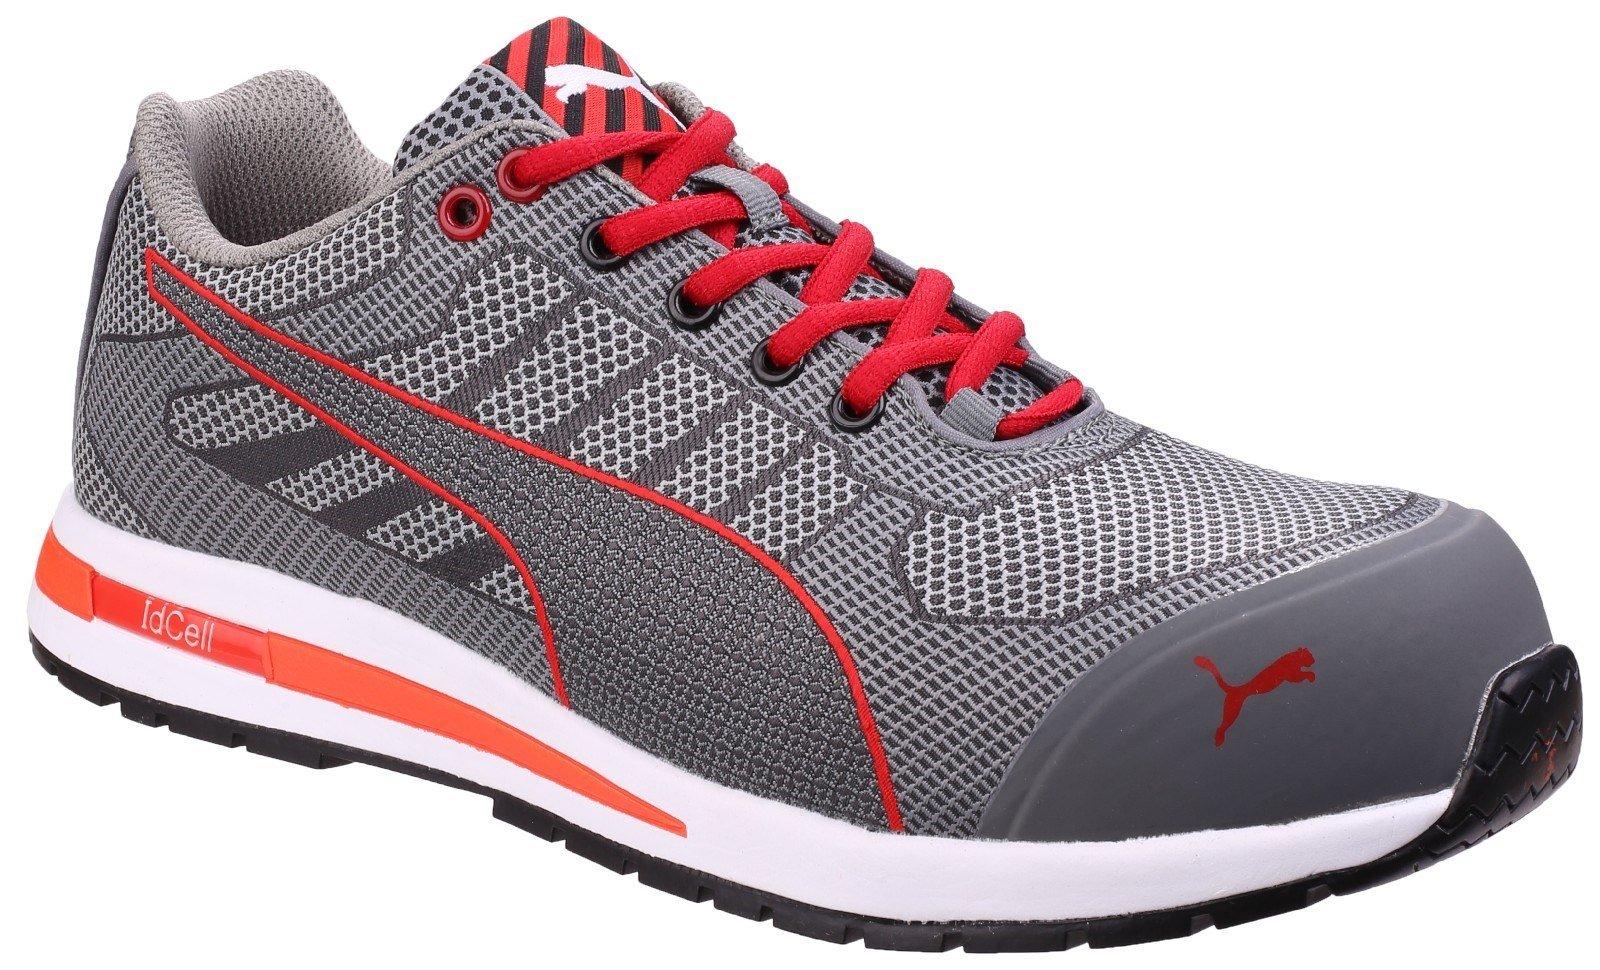 Puma Safety Unisex Xelerate Knit Low Trainer Grey 25459 - Grey 6